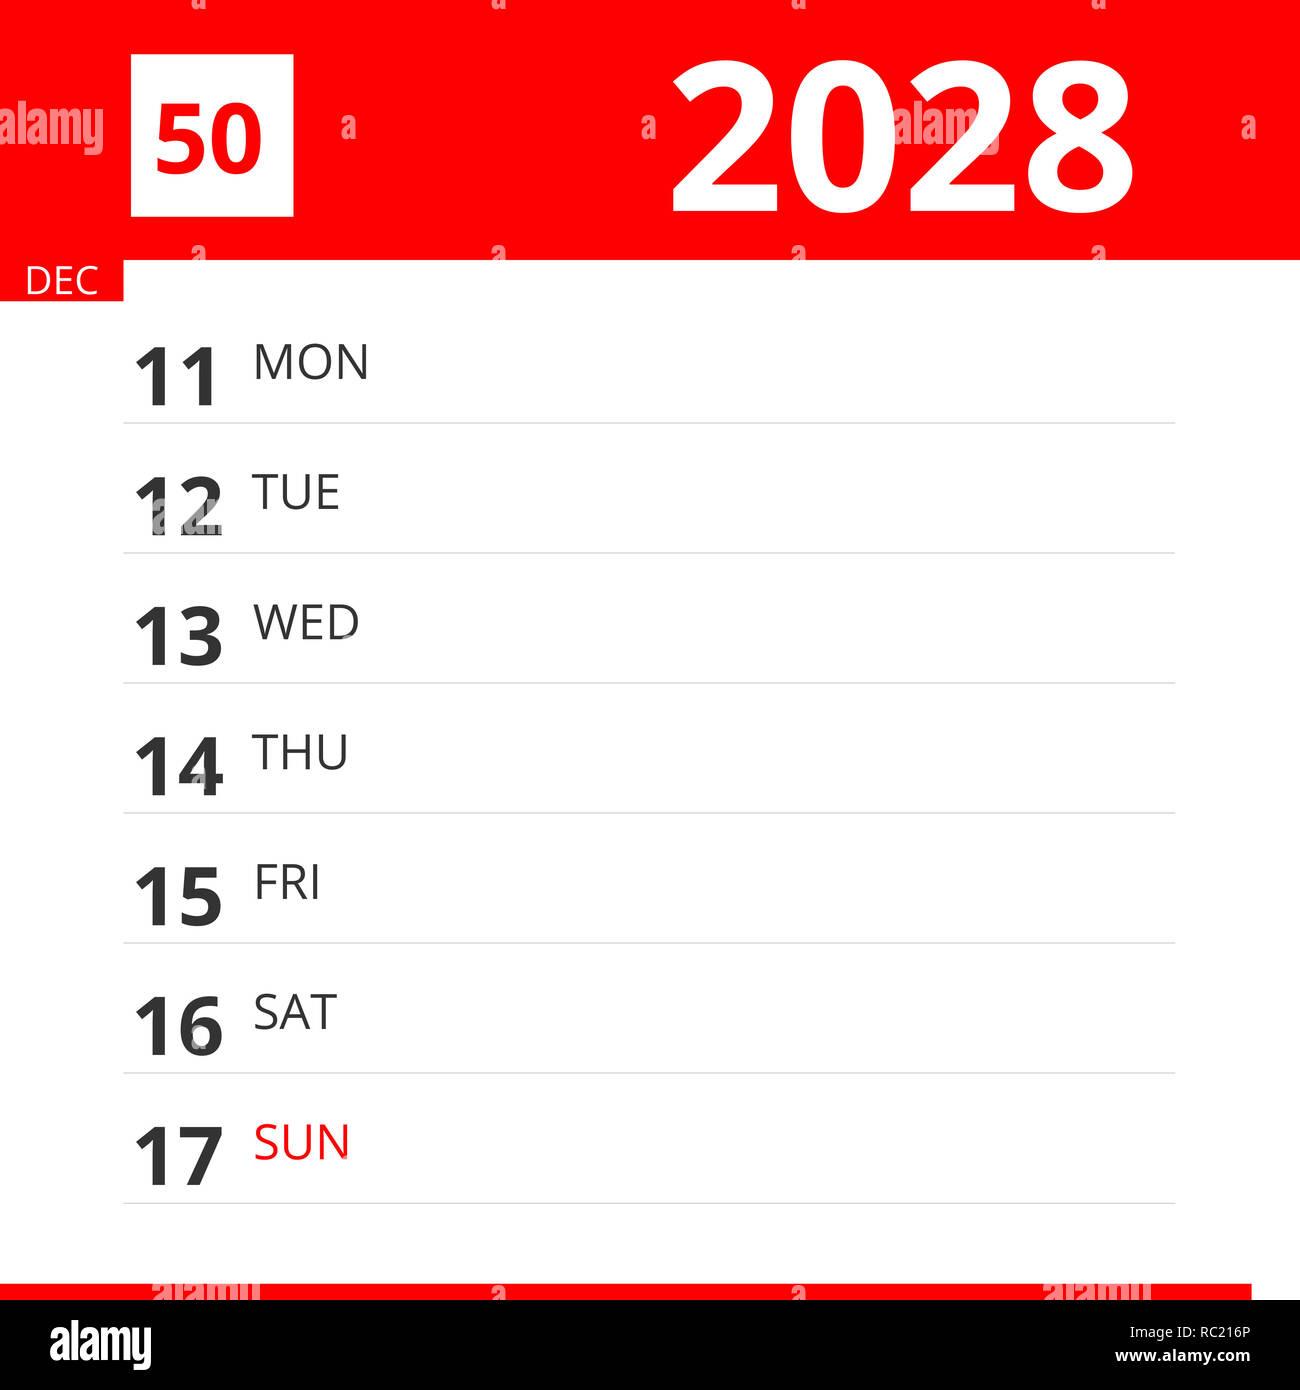 Calendario 216.Planificador De Calendario Para La Semana 50 De 2028